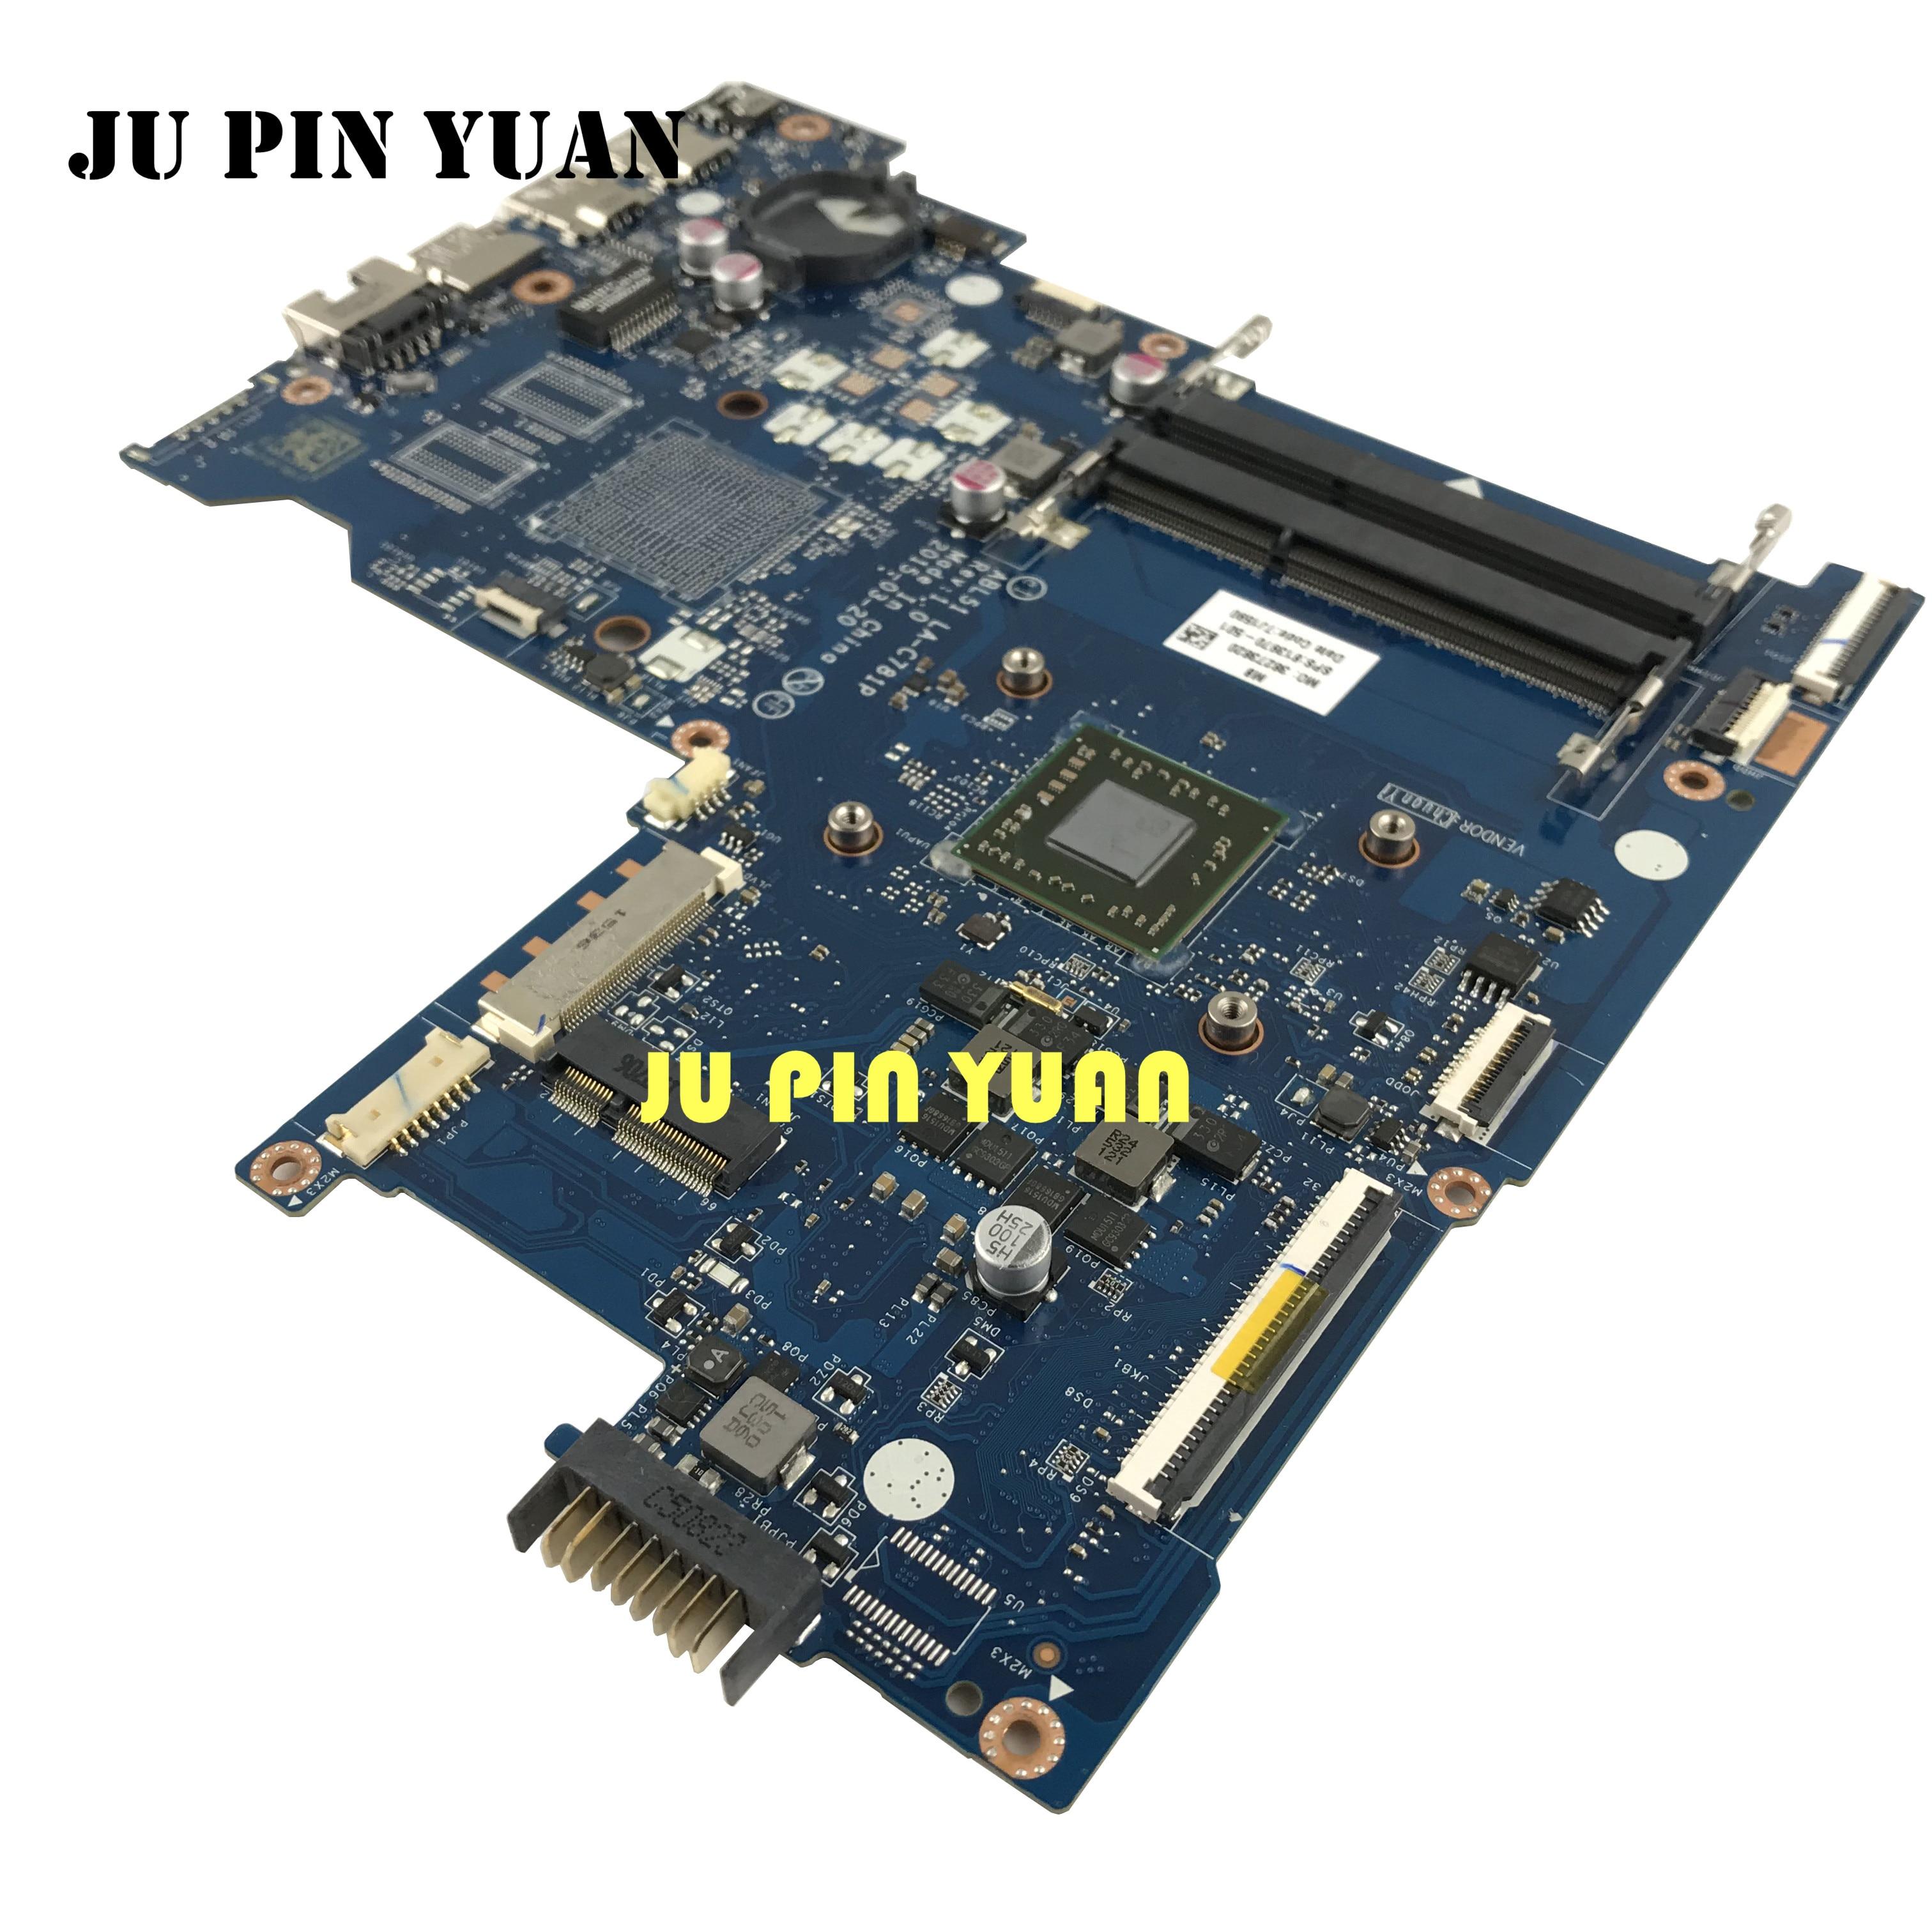 813970-001 813970-501 ABL51 LA-C781P Für HP Notebook 15Z-AF Serie Motherboard A8-7410 Alle Funktionen Vollständig Getestet